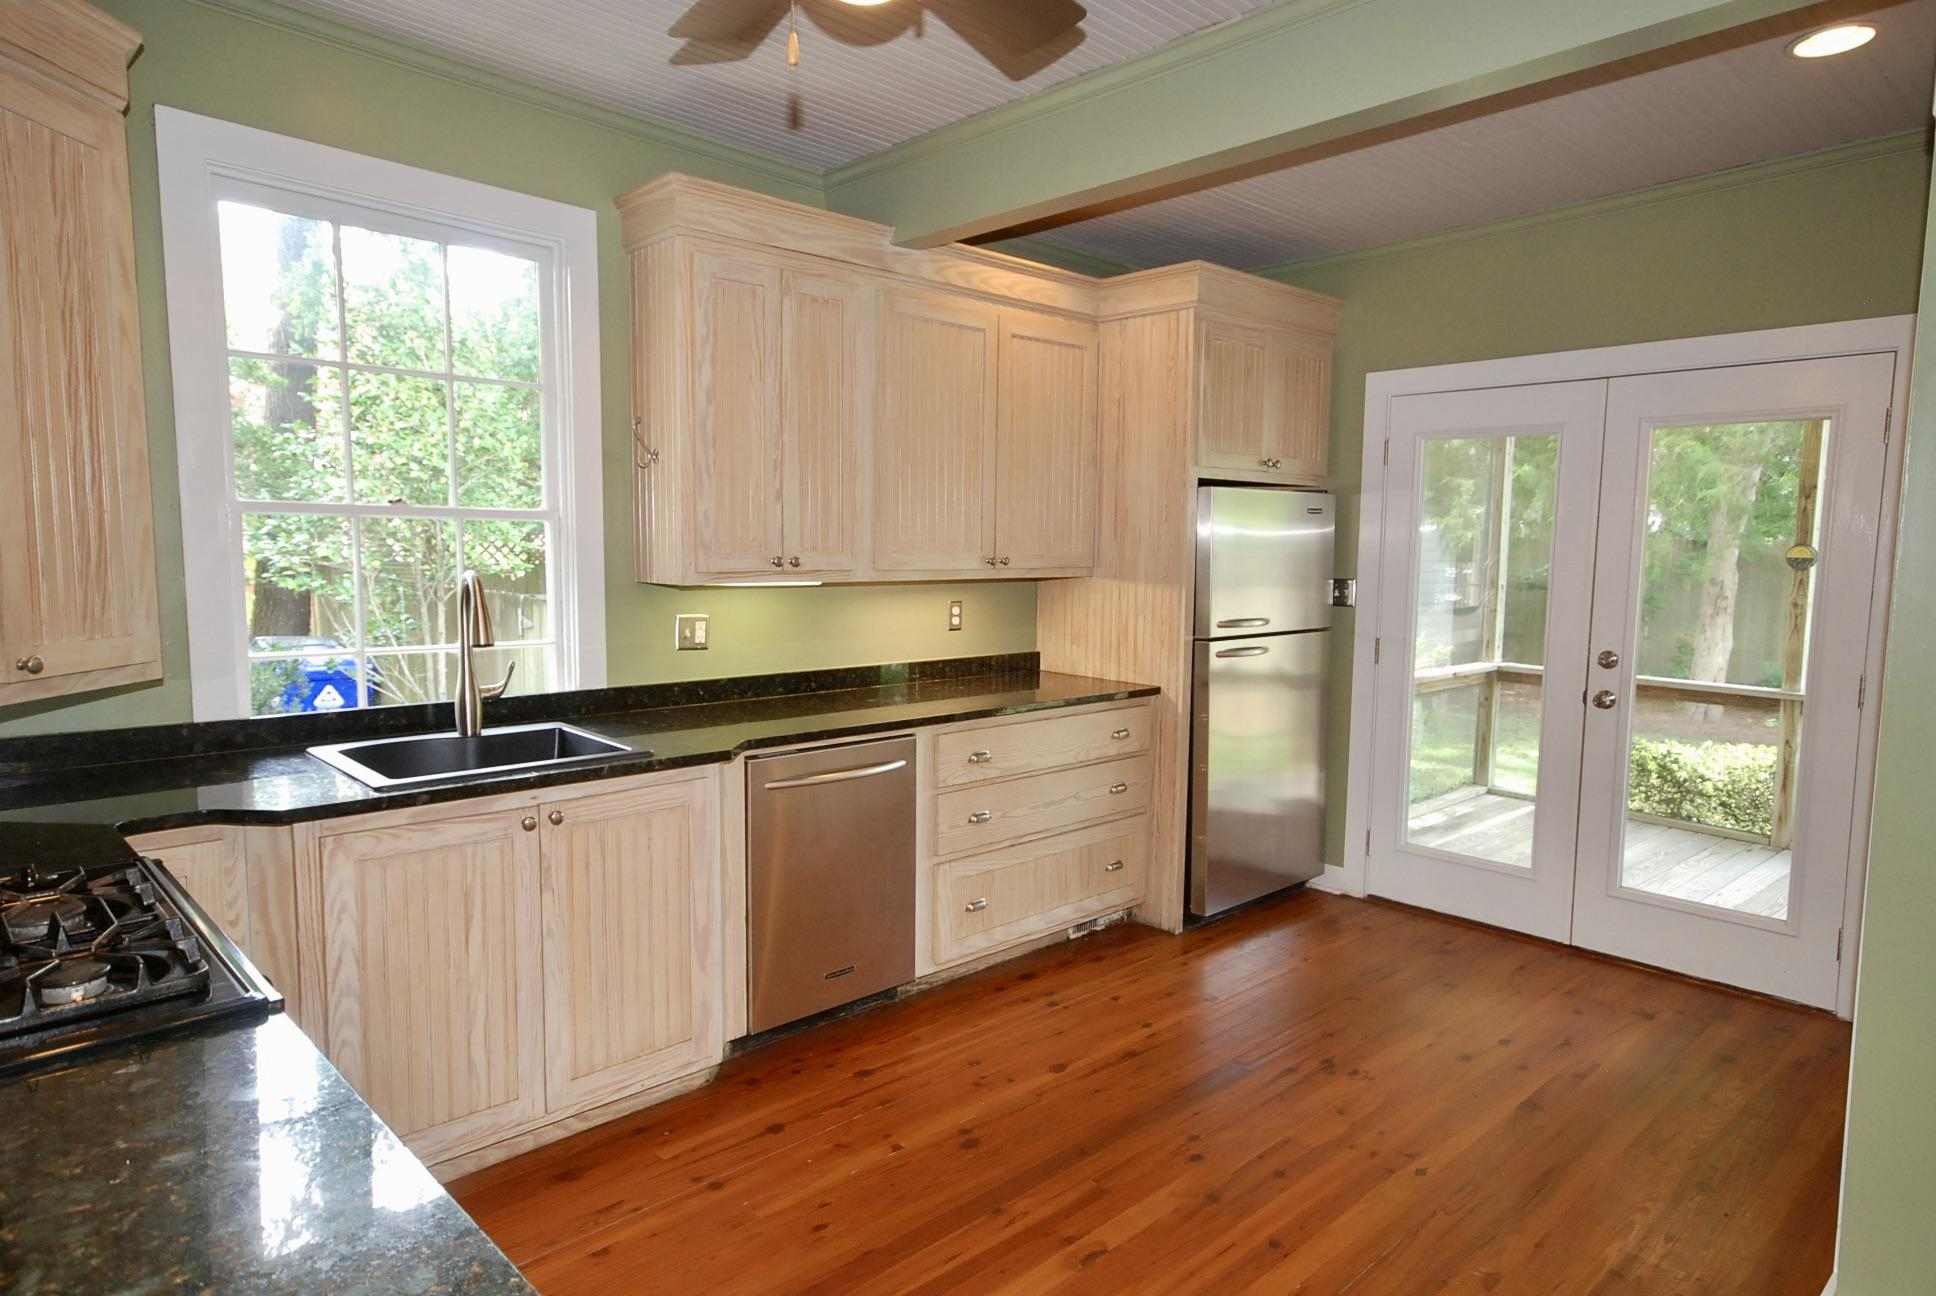 Carolina Terrace Homes For Sale - 28 Lolandra, Charleston, SC - 0